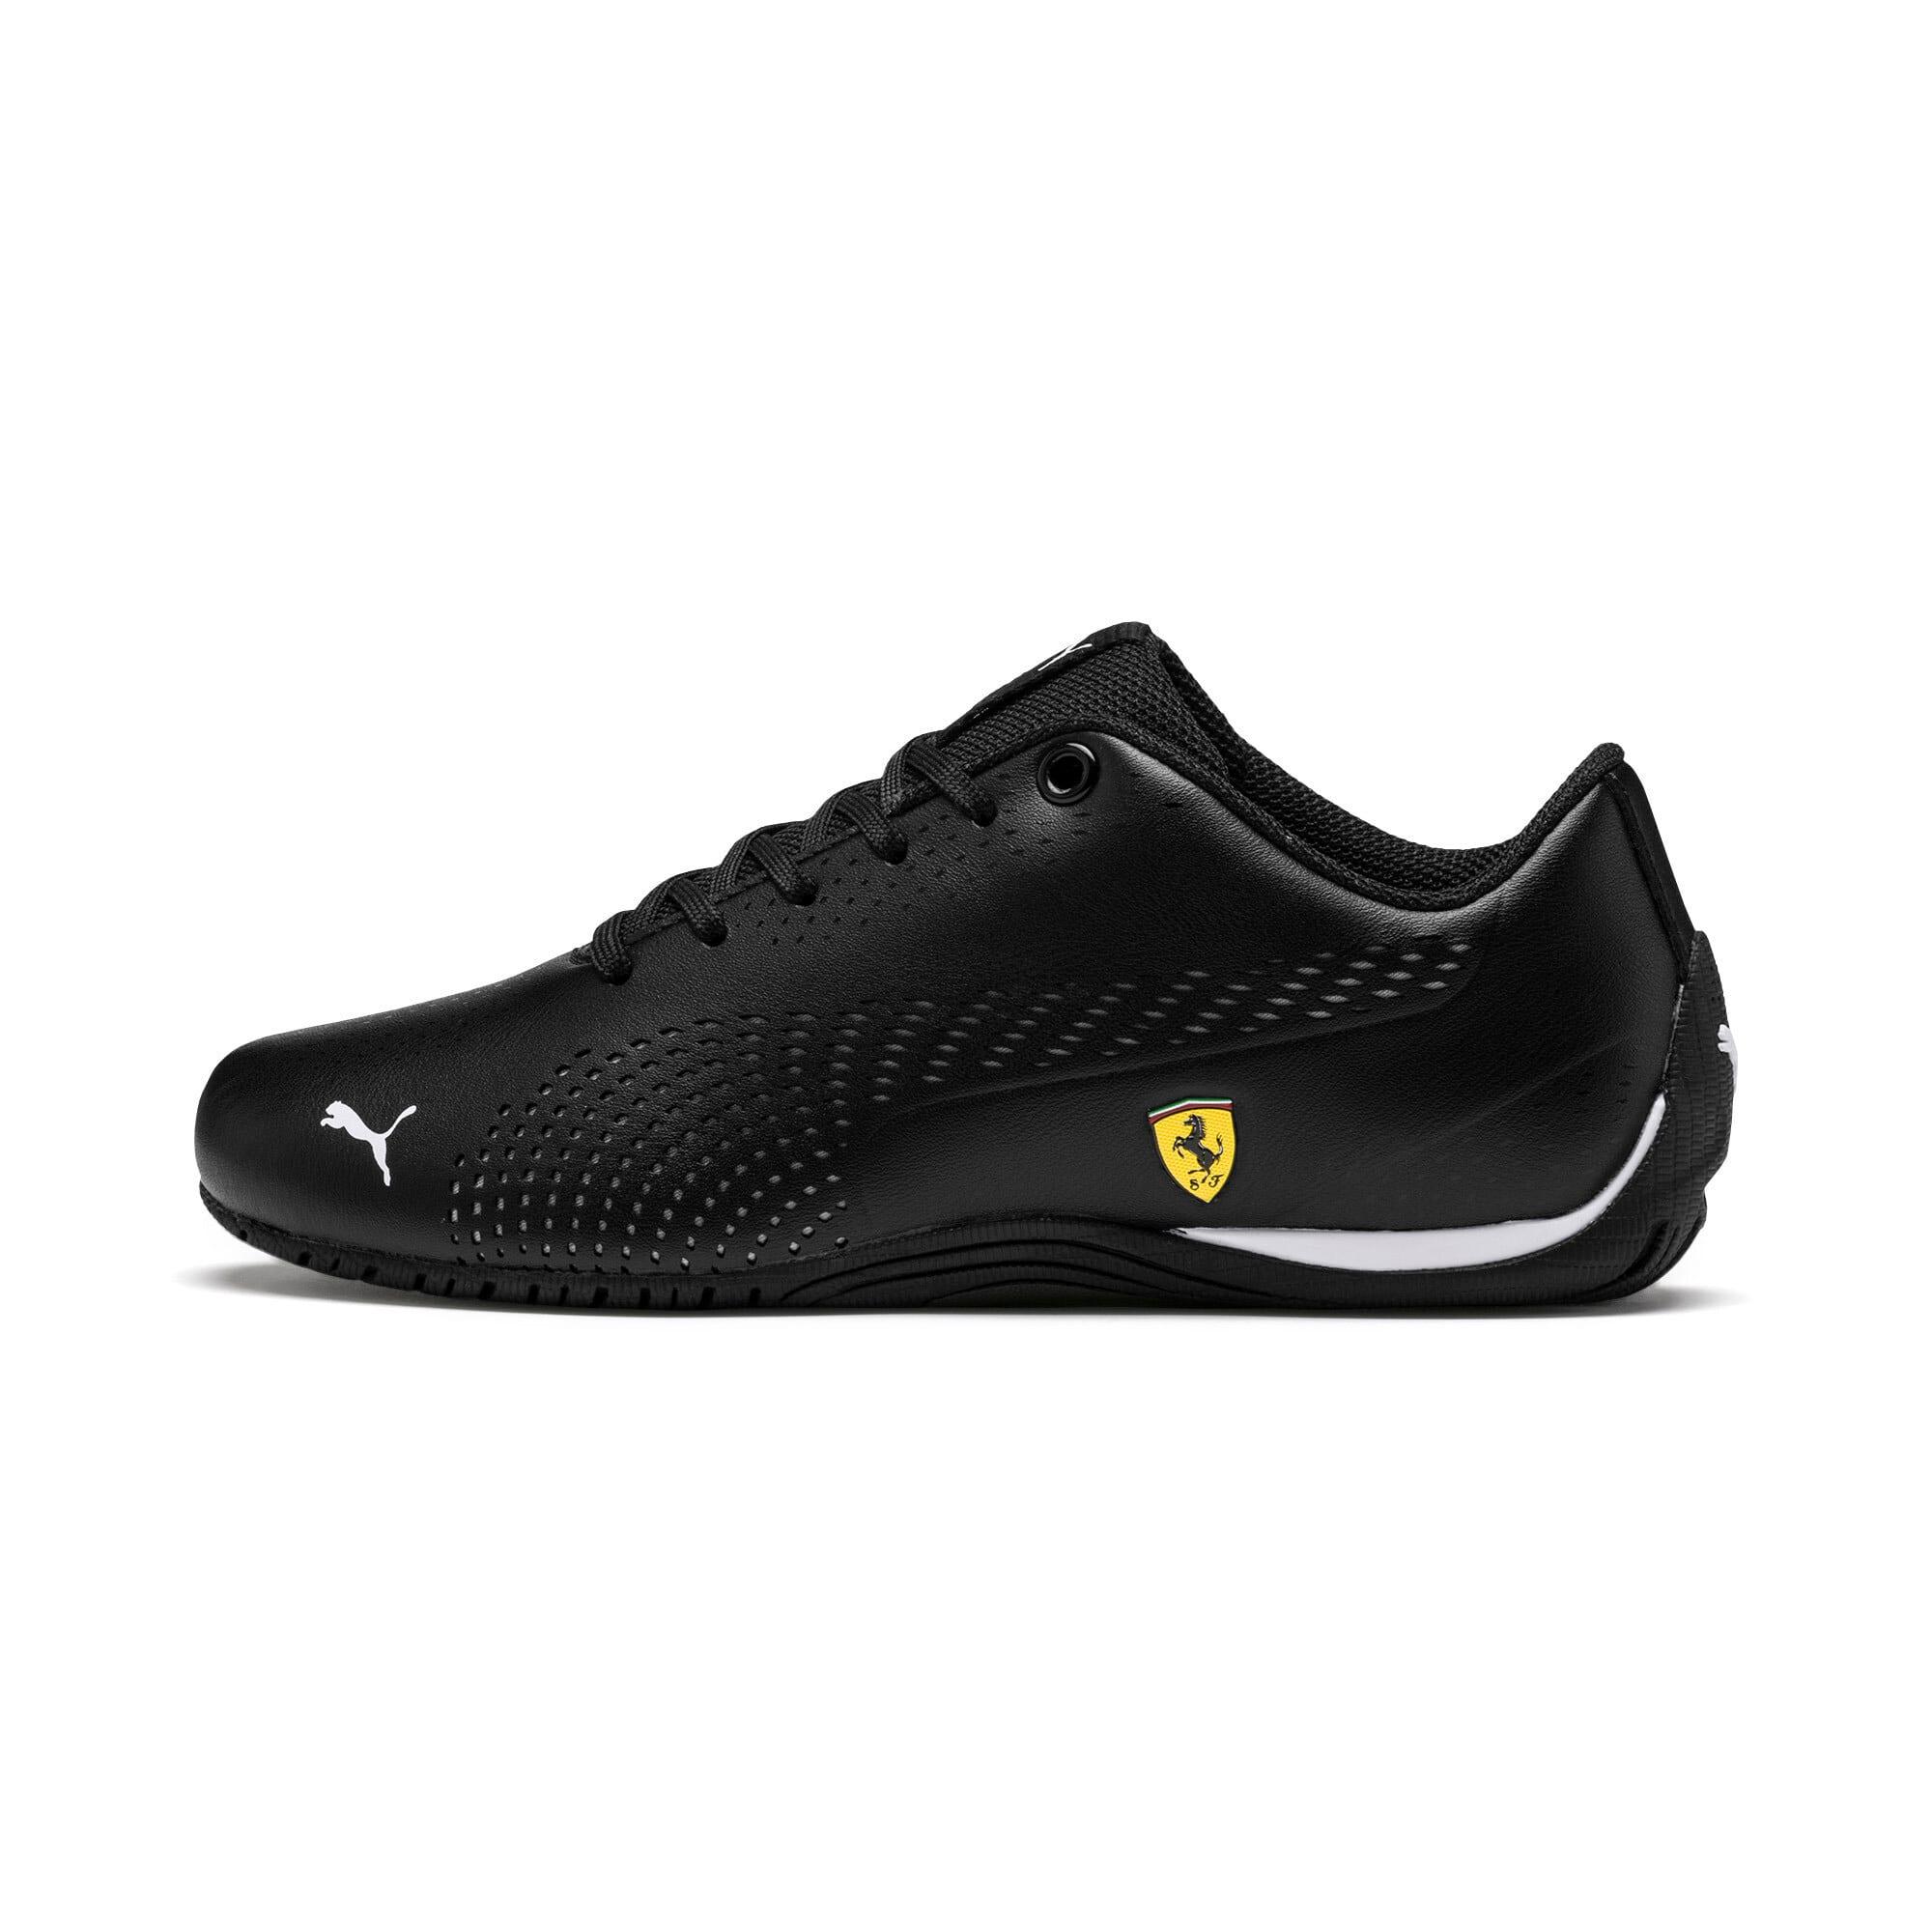 Thumbnail 1 of Scuderia Ferrari Drift Cat 5 Ultra II Shoes JR, Puma Black-Puma White, medium